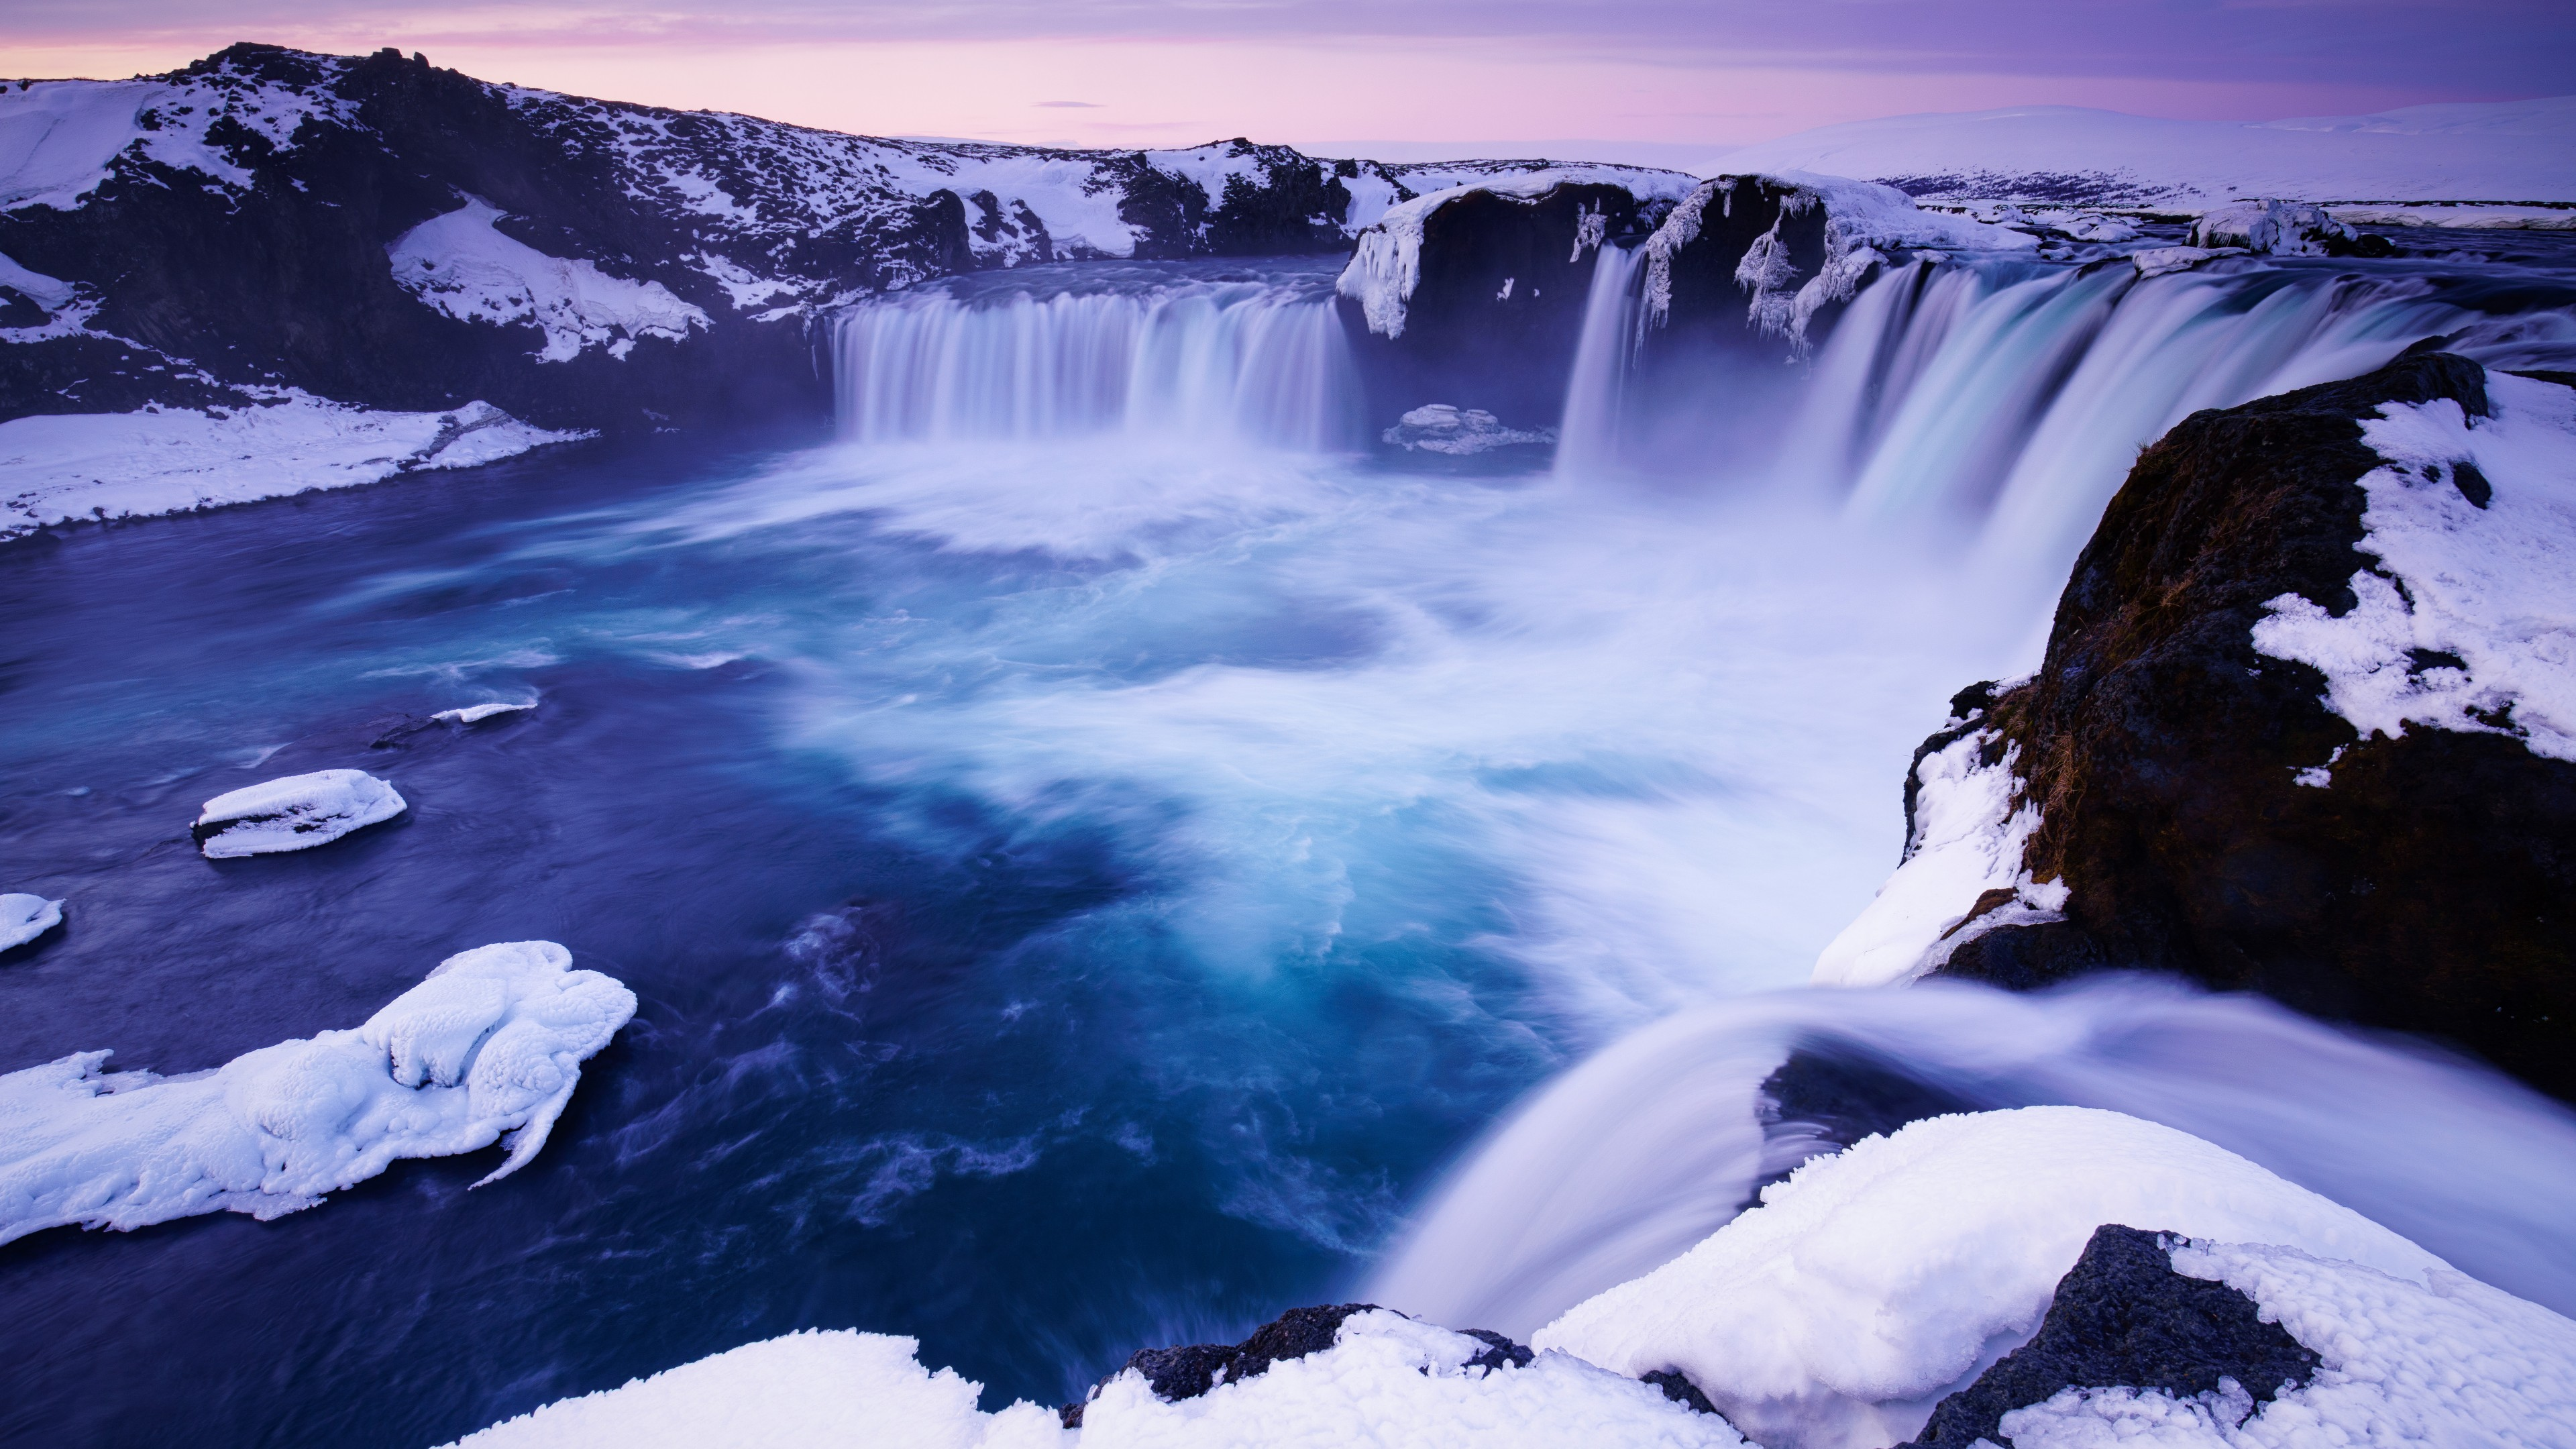 godafoss falls waterfall snow 1574939424 - Godafoss Falls Waterfall Snow -